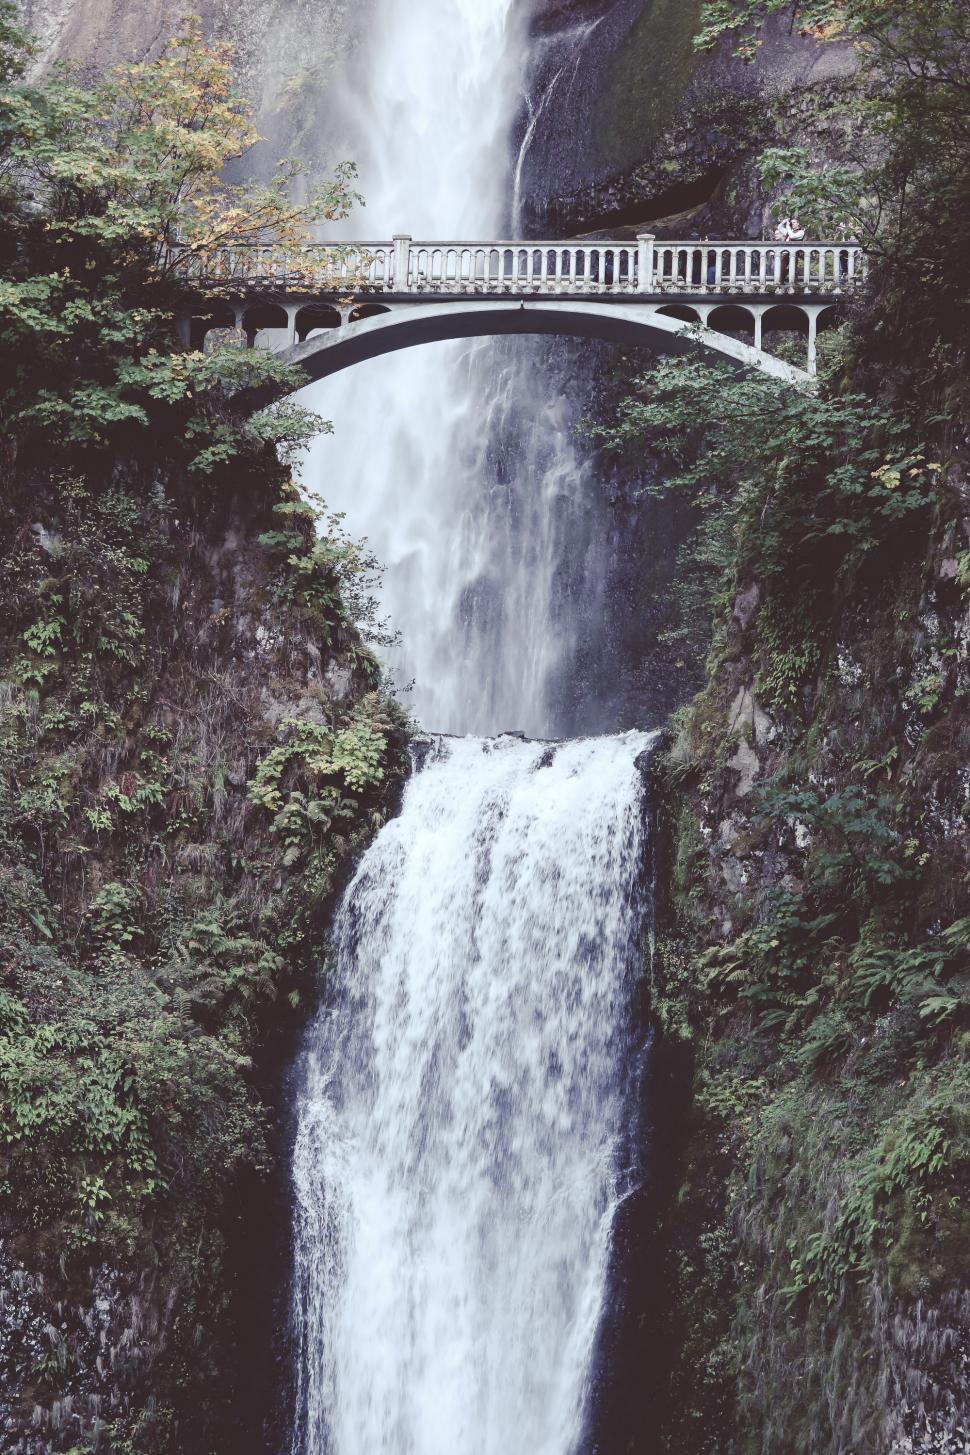 Download Free Stock HD Photo of Bridge over Multnomah Falls, Oregon, USA Online